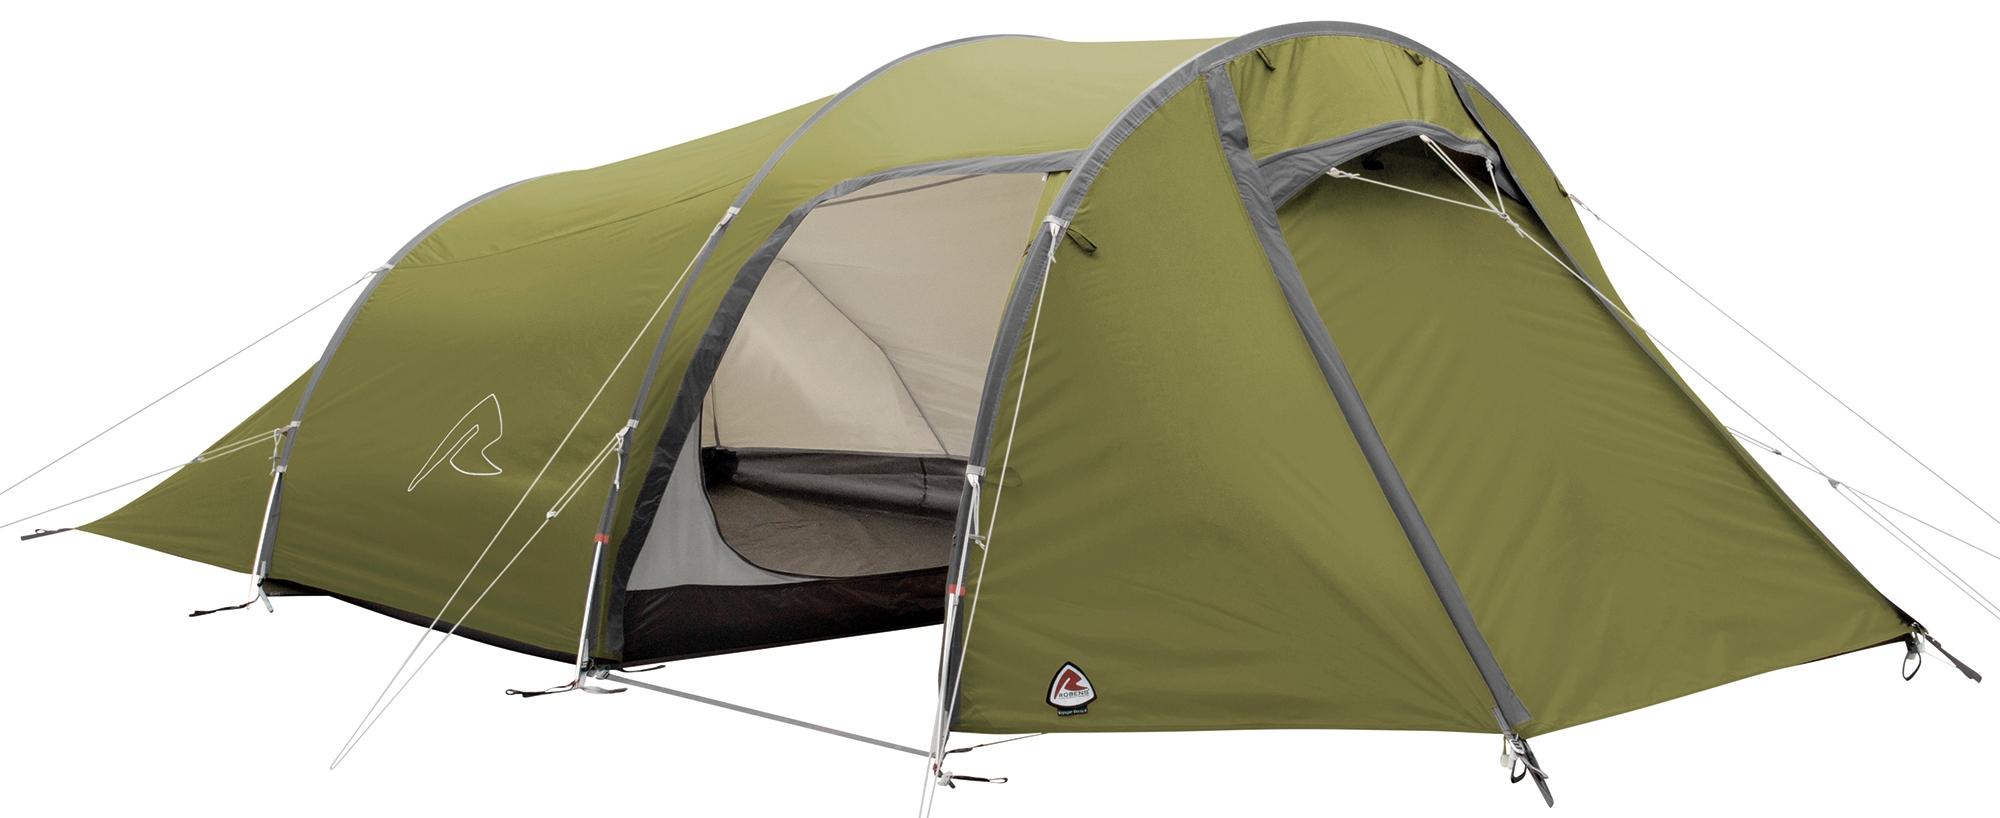 Robens Voyager Versa 4 Tent 2020 Model